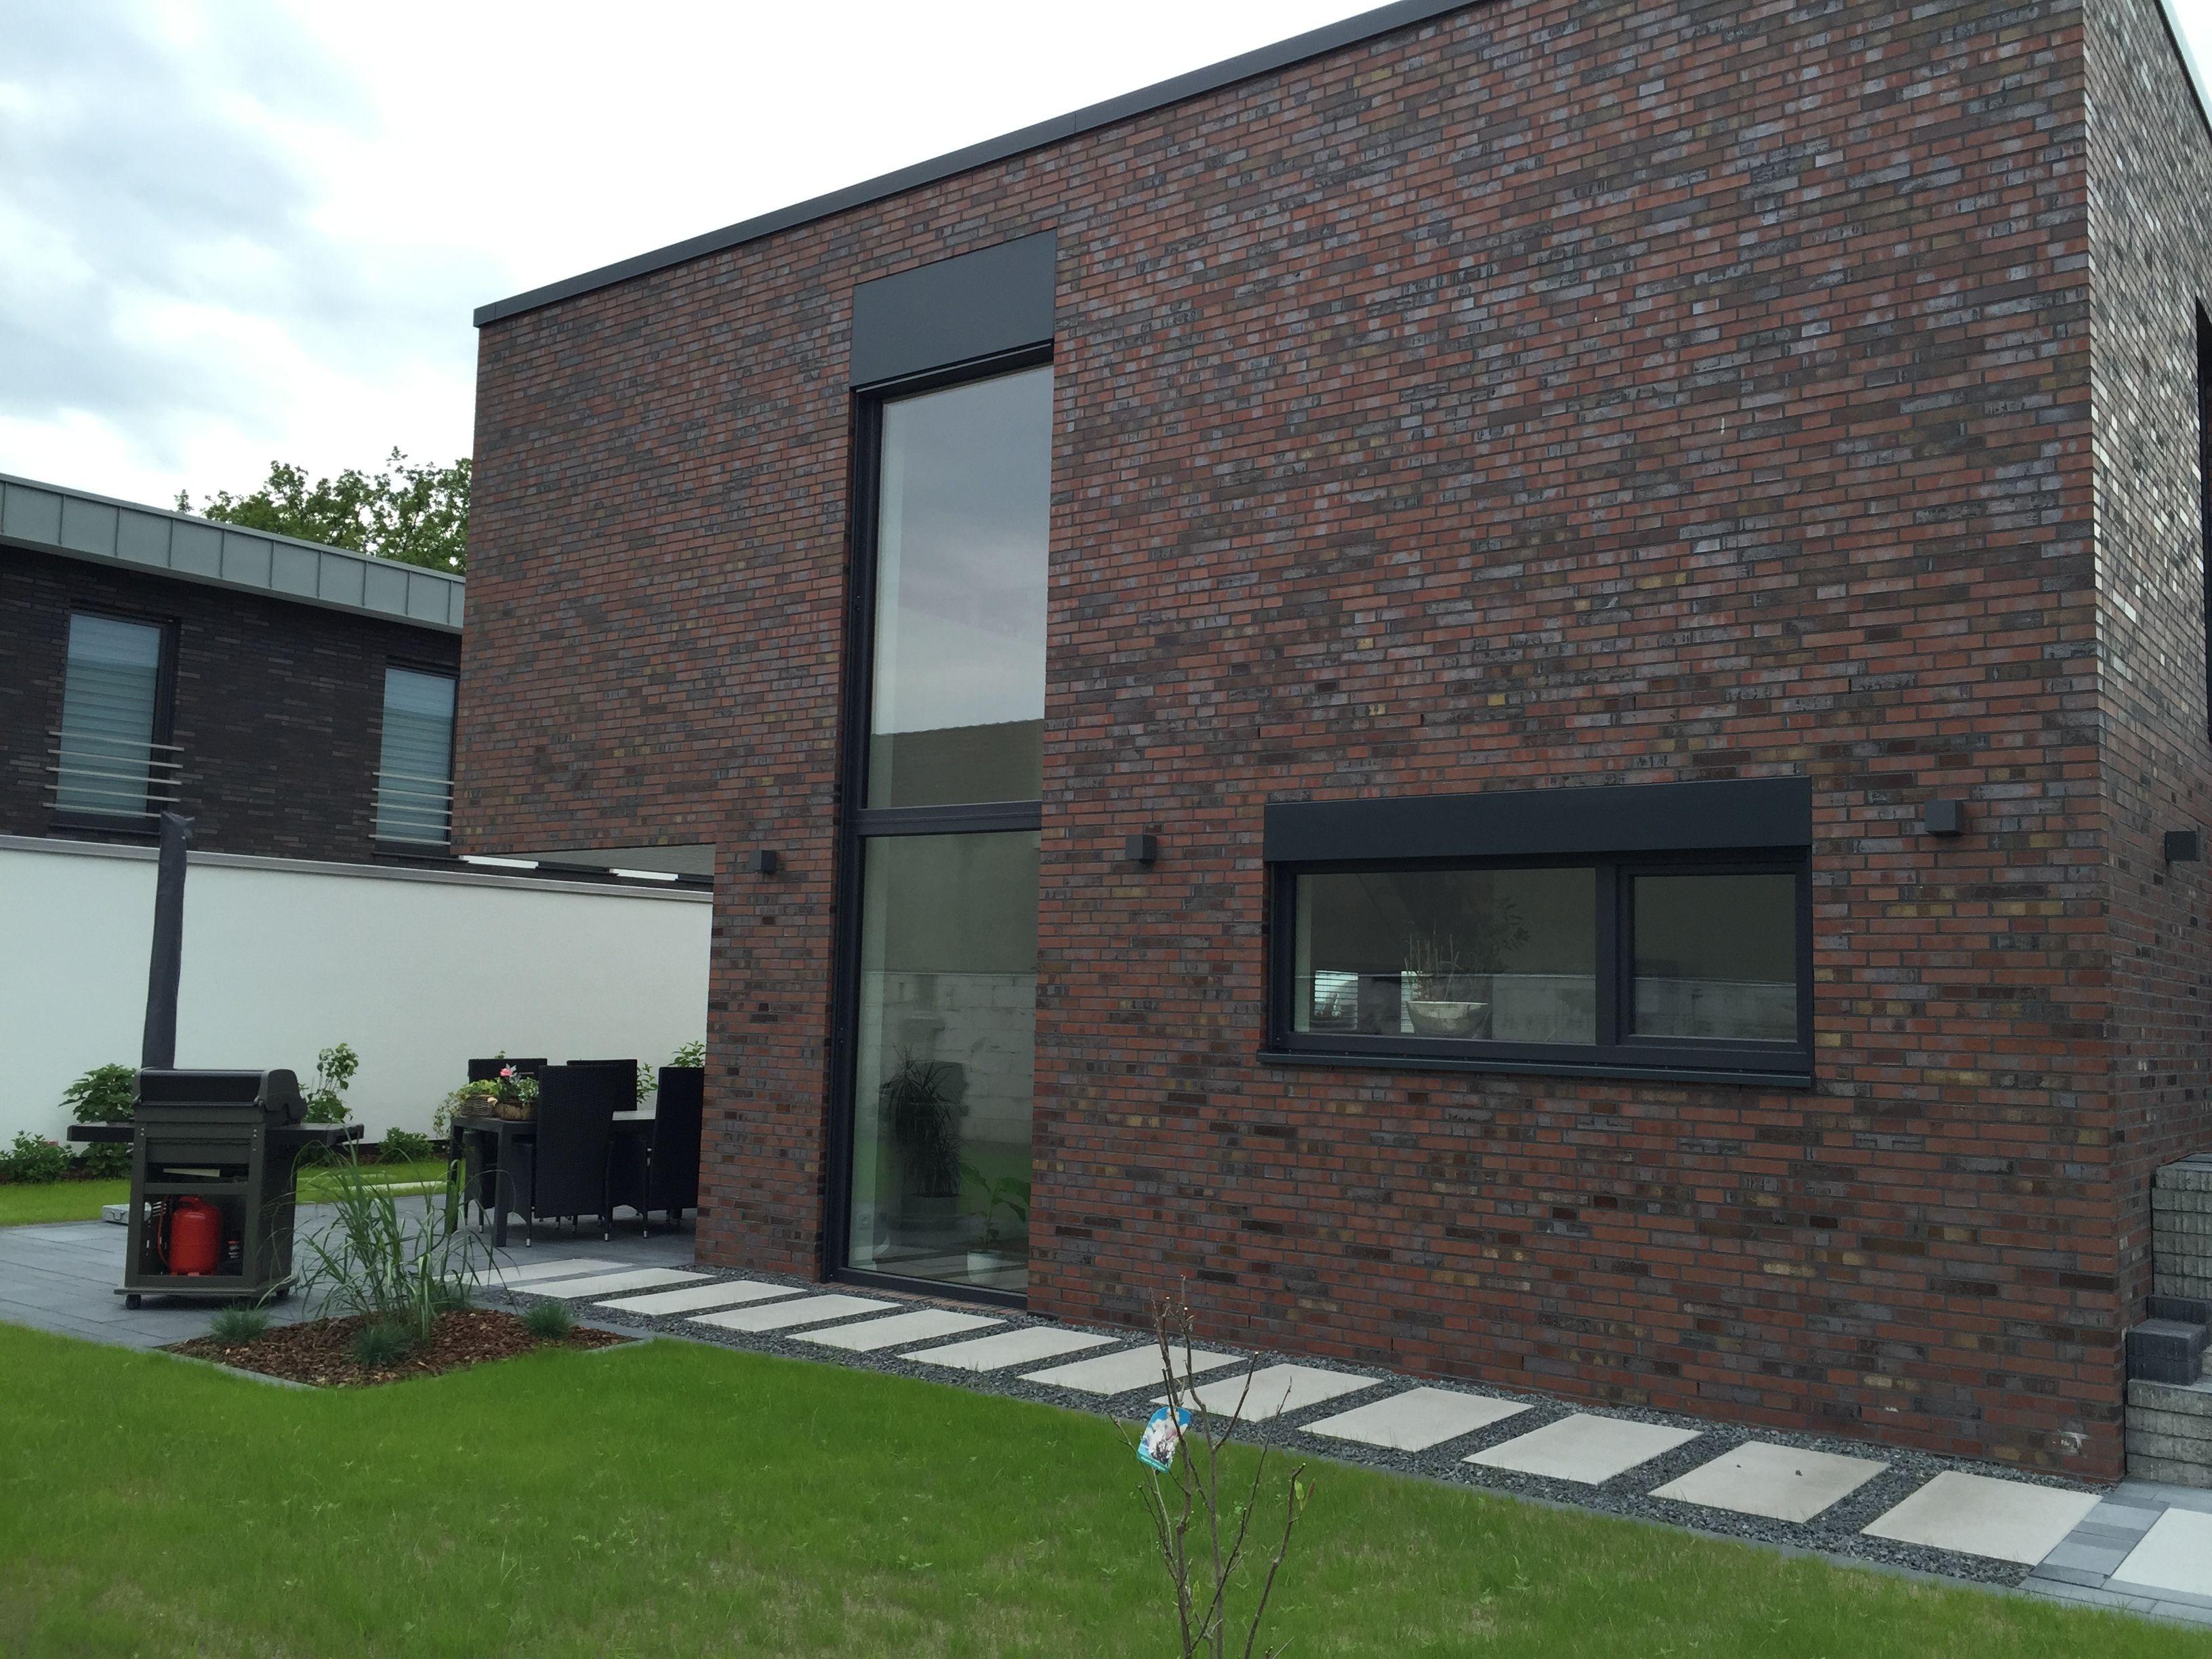 gartenansicht des kubus hauses hausbau 2015 pinterest. Black Bedroom Furniture Sets. Home Design Ideas